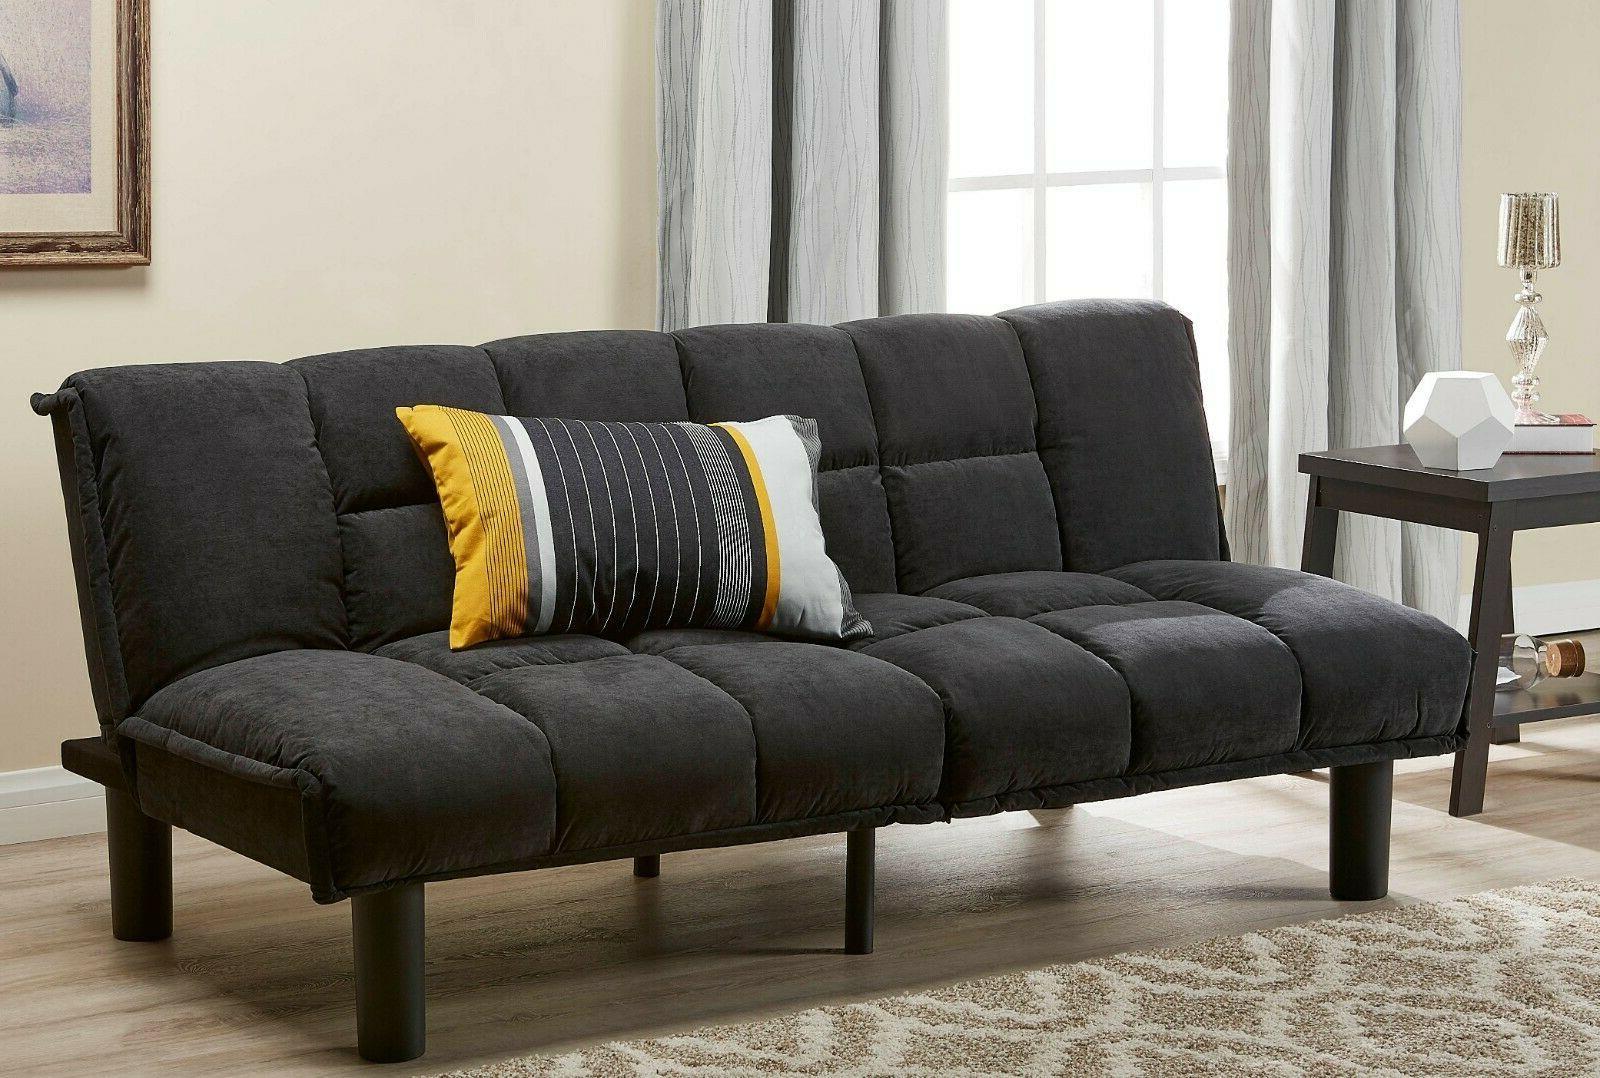 Tufted Microfiber Futon 600 lb Capacity Convertible Sofa To